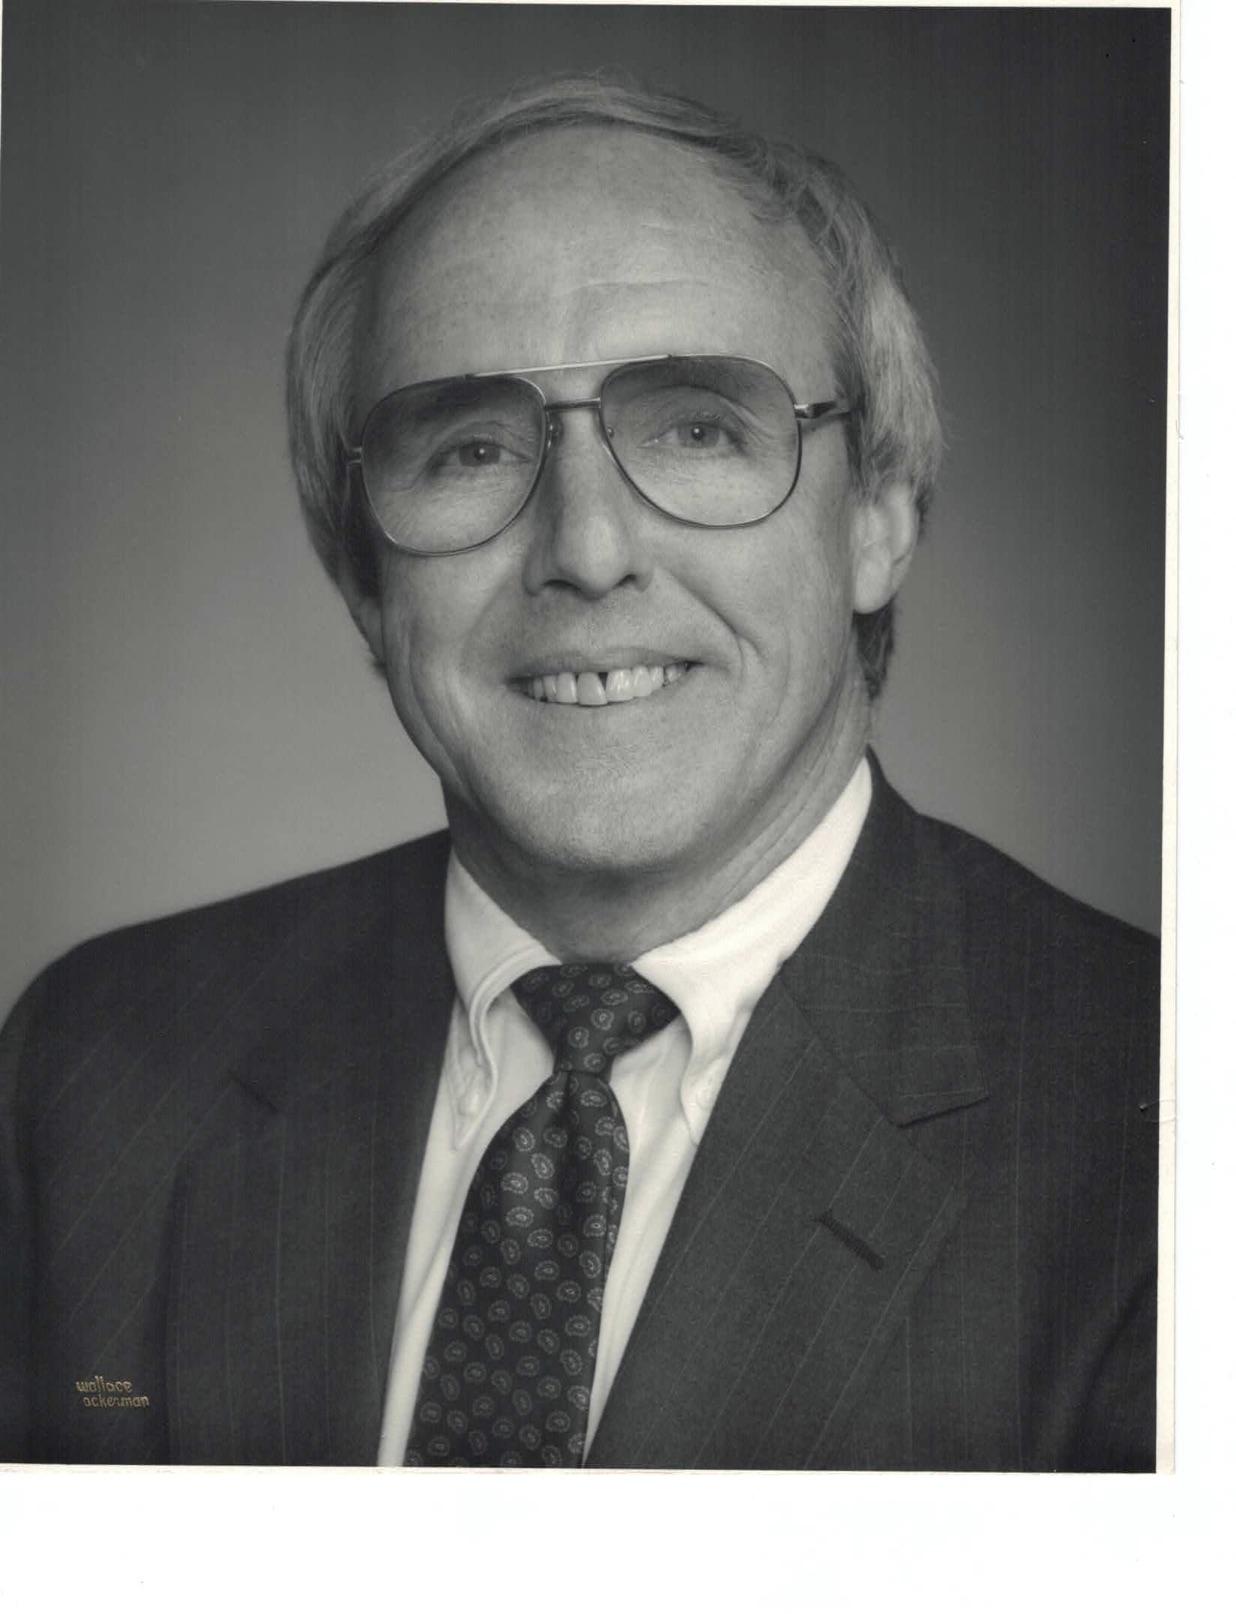 JOHN S. GALLANT 1990-91